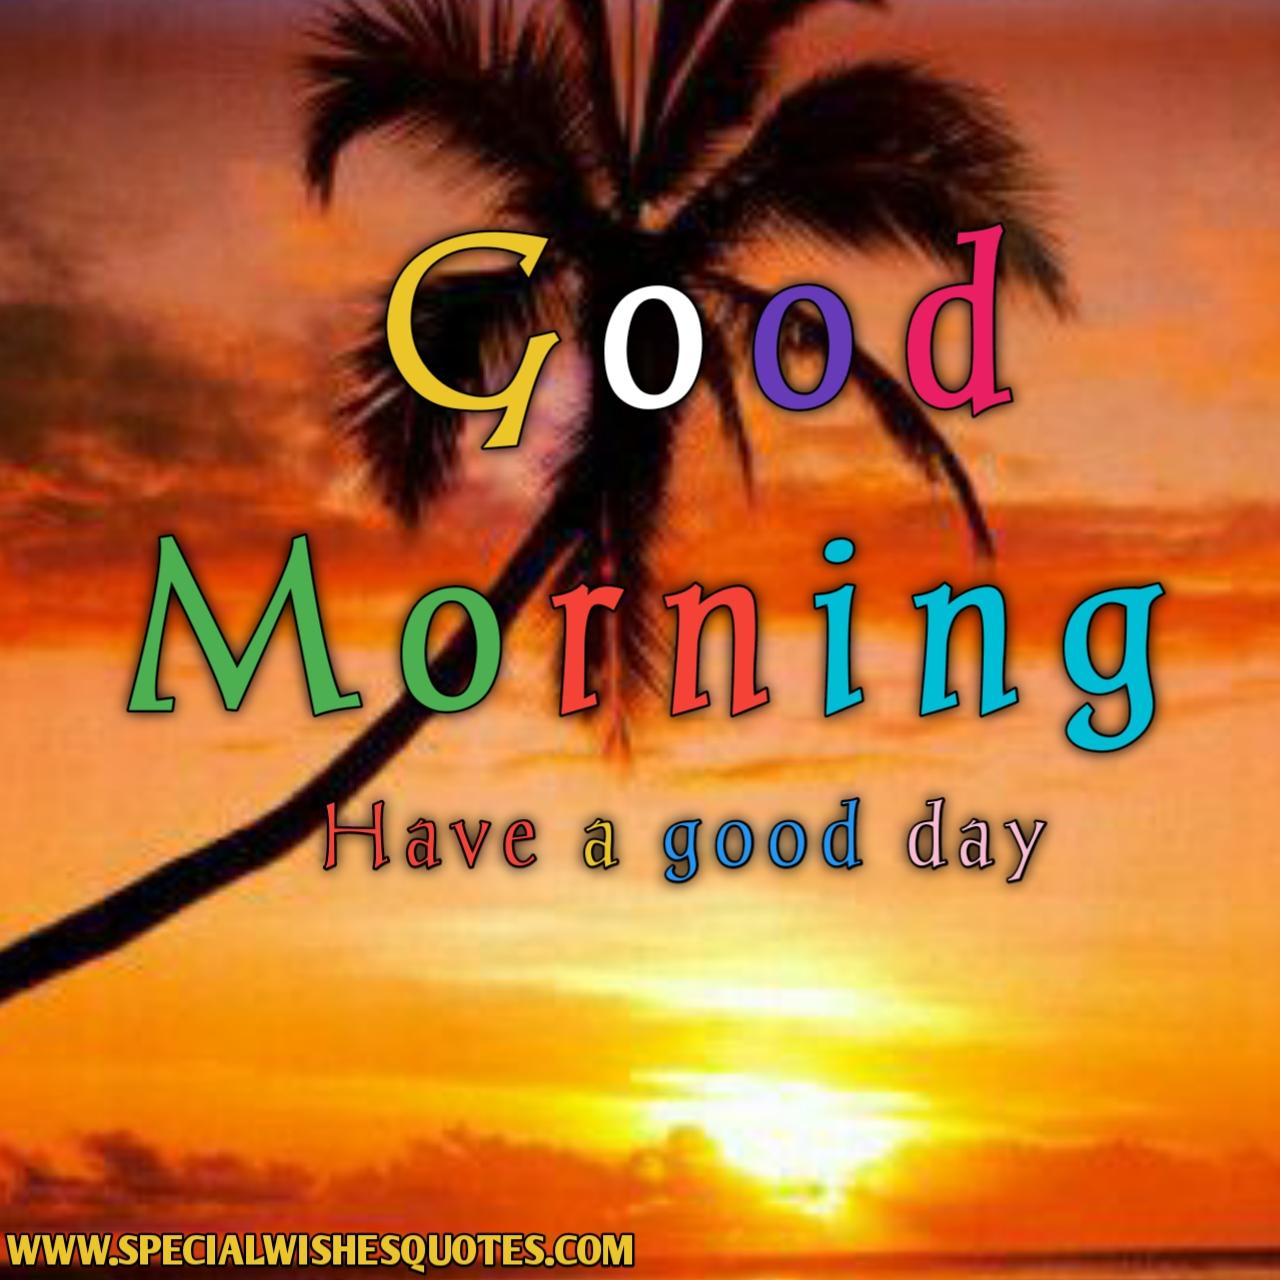 good morning photos hd